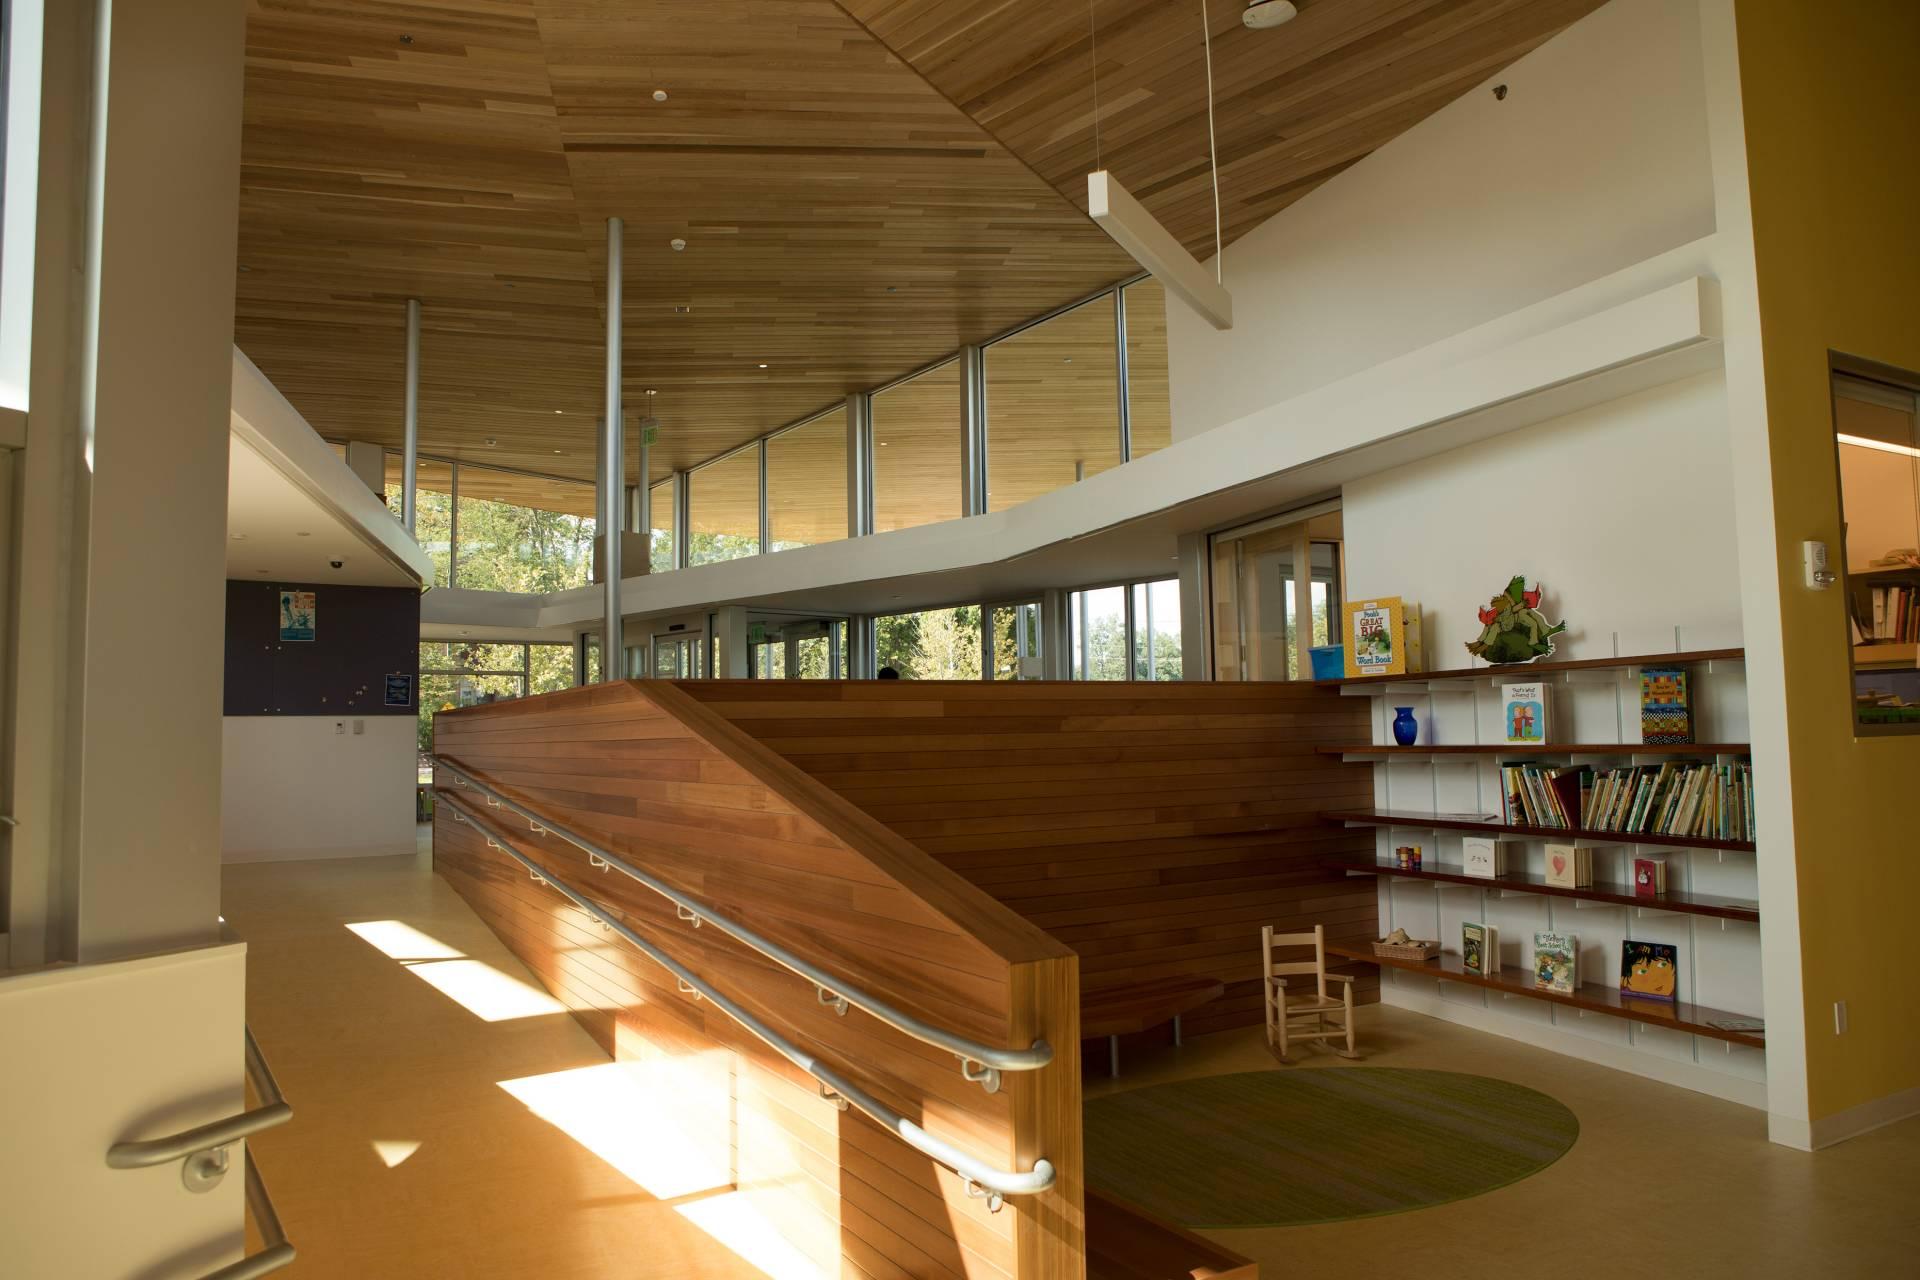 university opens new child care center